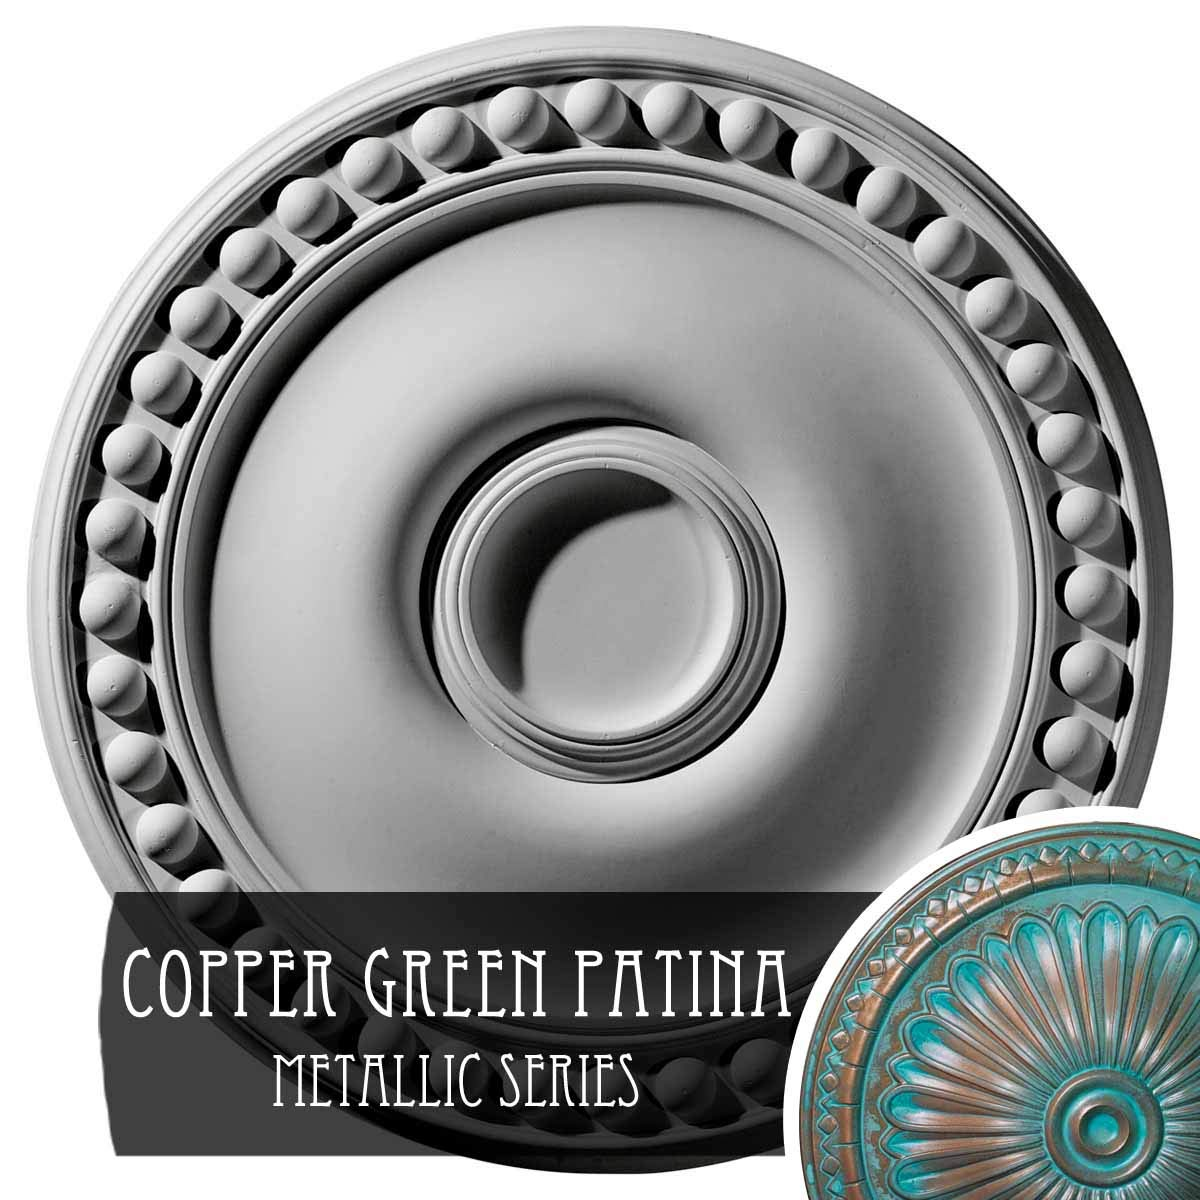 Ekena Millwork CM19FOCGS Foster Ceiling Medallion, 19 1/8'' OD x 1'' P, Copper Green Patina